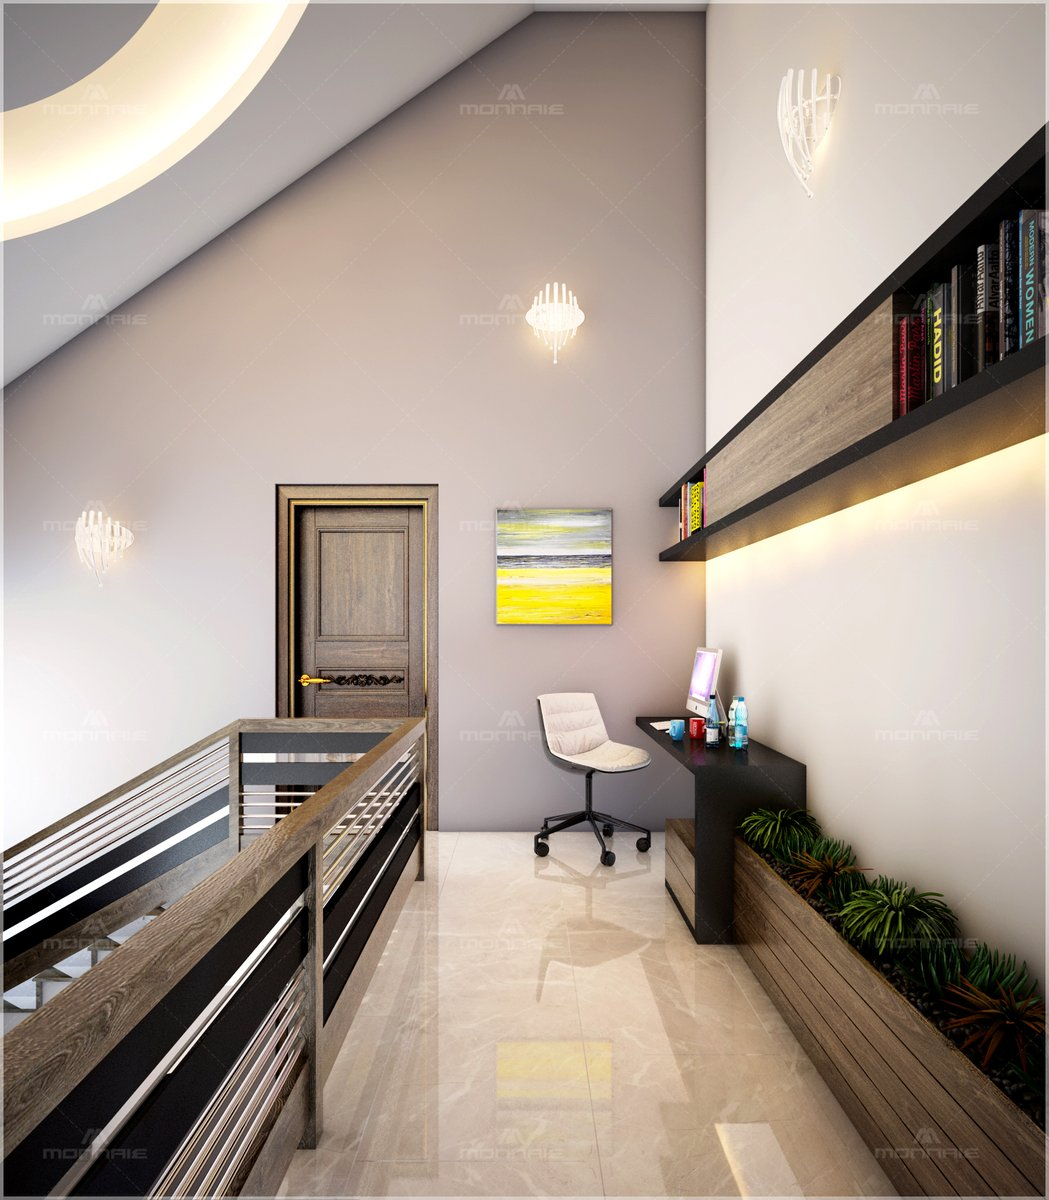 Simple and unique passage designs... Unique your home@  http://www. monnaie.in     #monnaie #architecturaldesign #interiordesign #homedesign #bestarchitectsinkochi #passagedesigns <br>http://pic.twitter.com/E50hu5Ywam